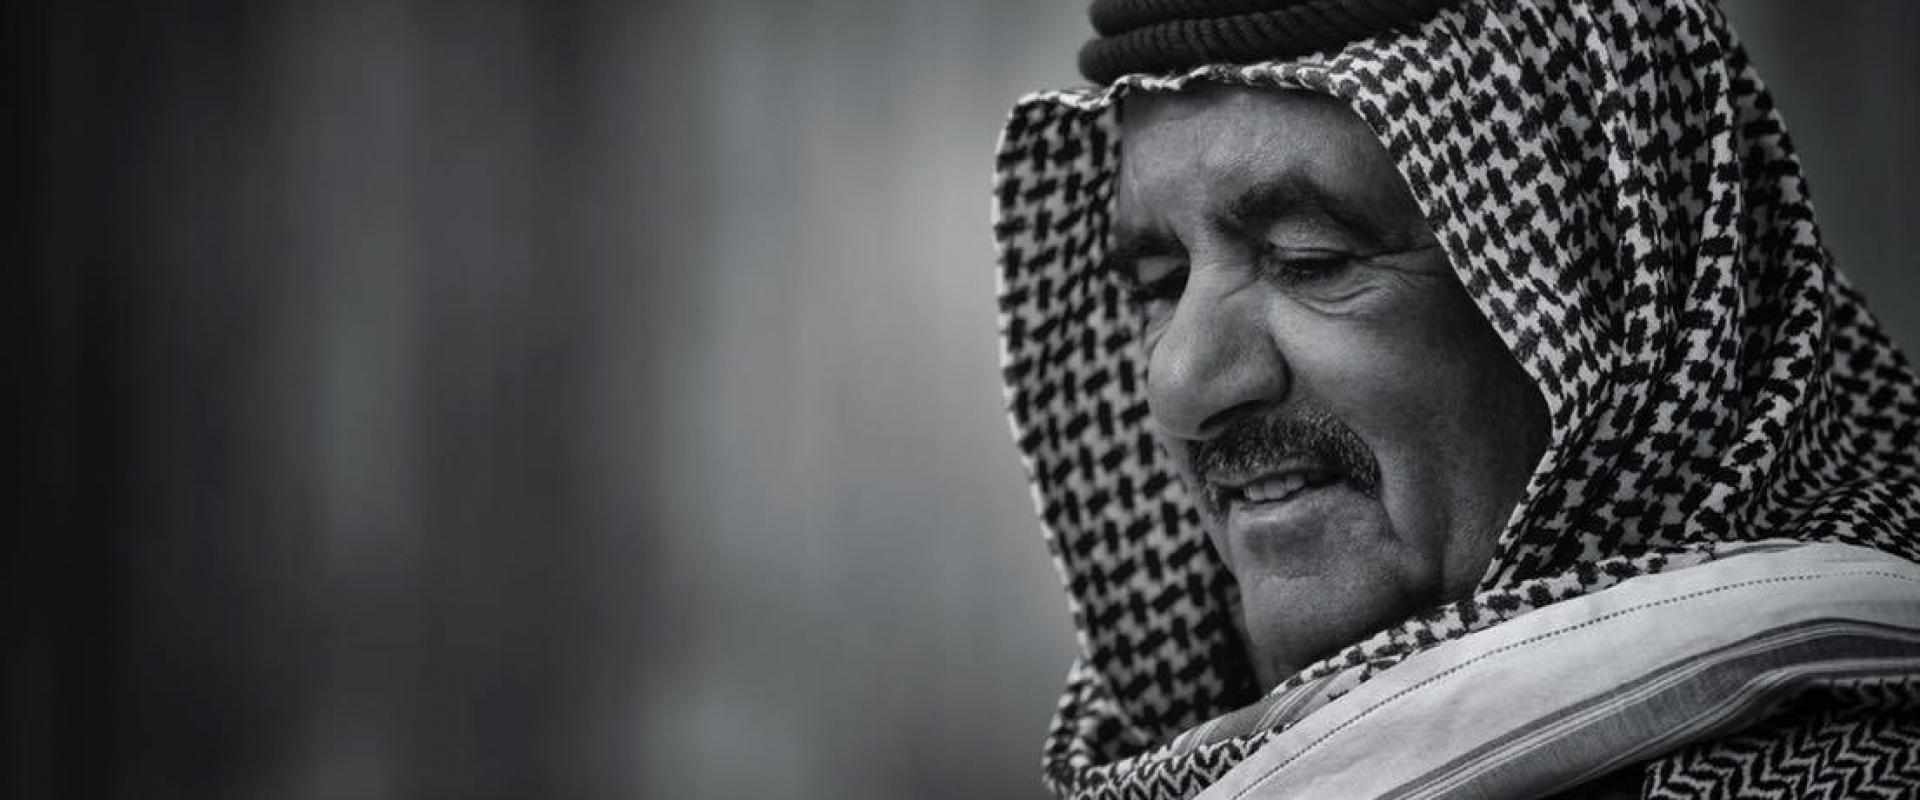 The Ismaili Centre Dubai offers condolences on the passing of Sheikh Hamdan bin Rashid Al Maktoum